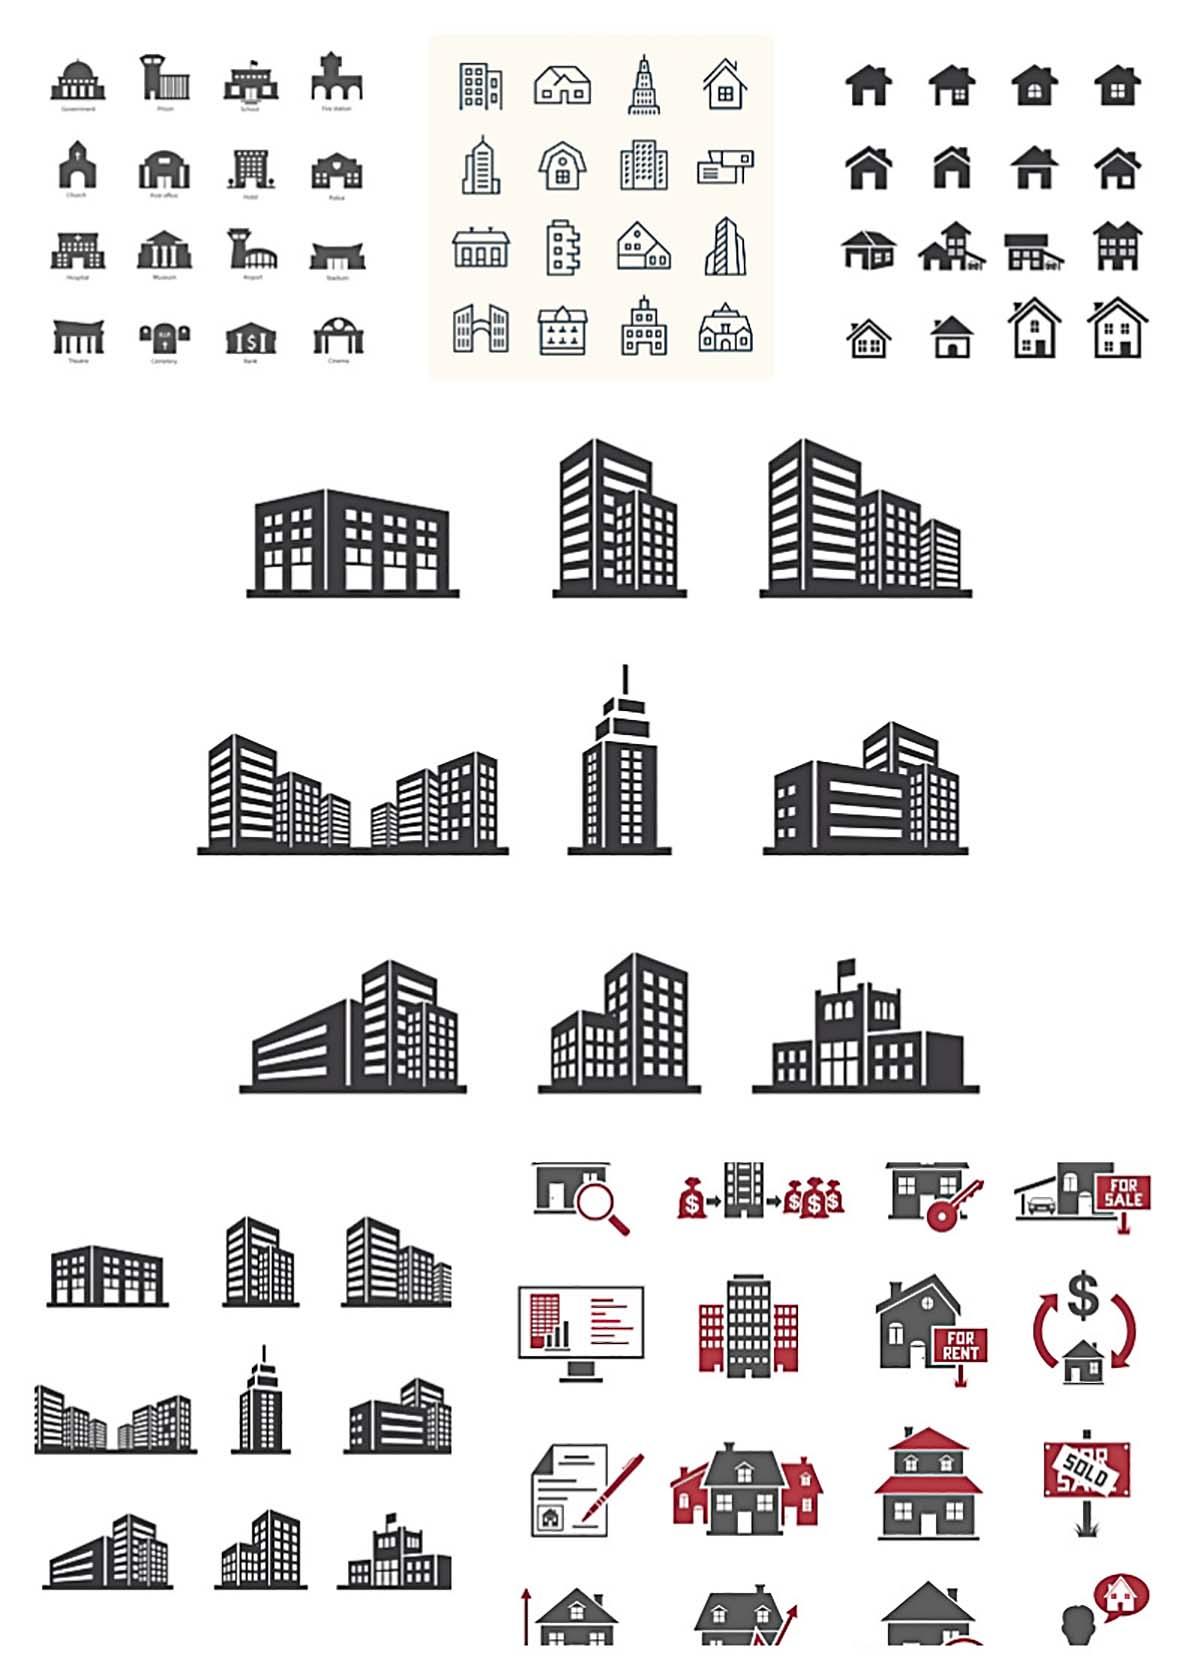 Real estate icons bundle